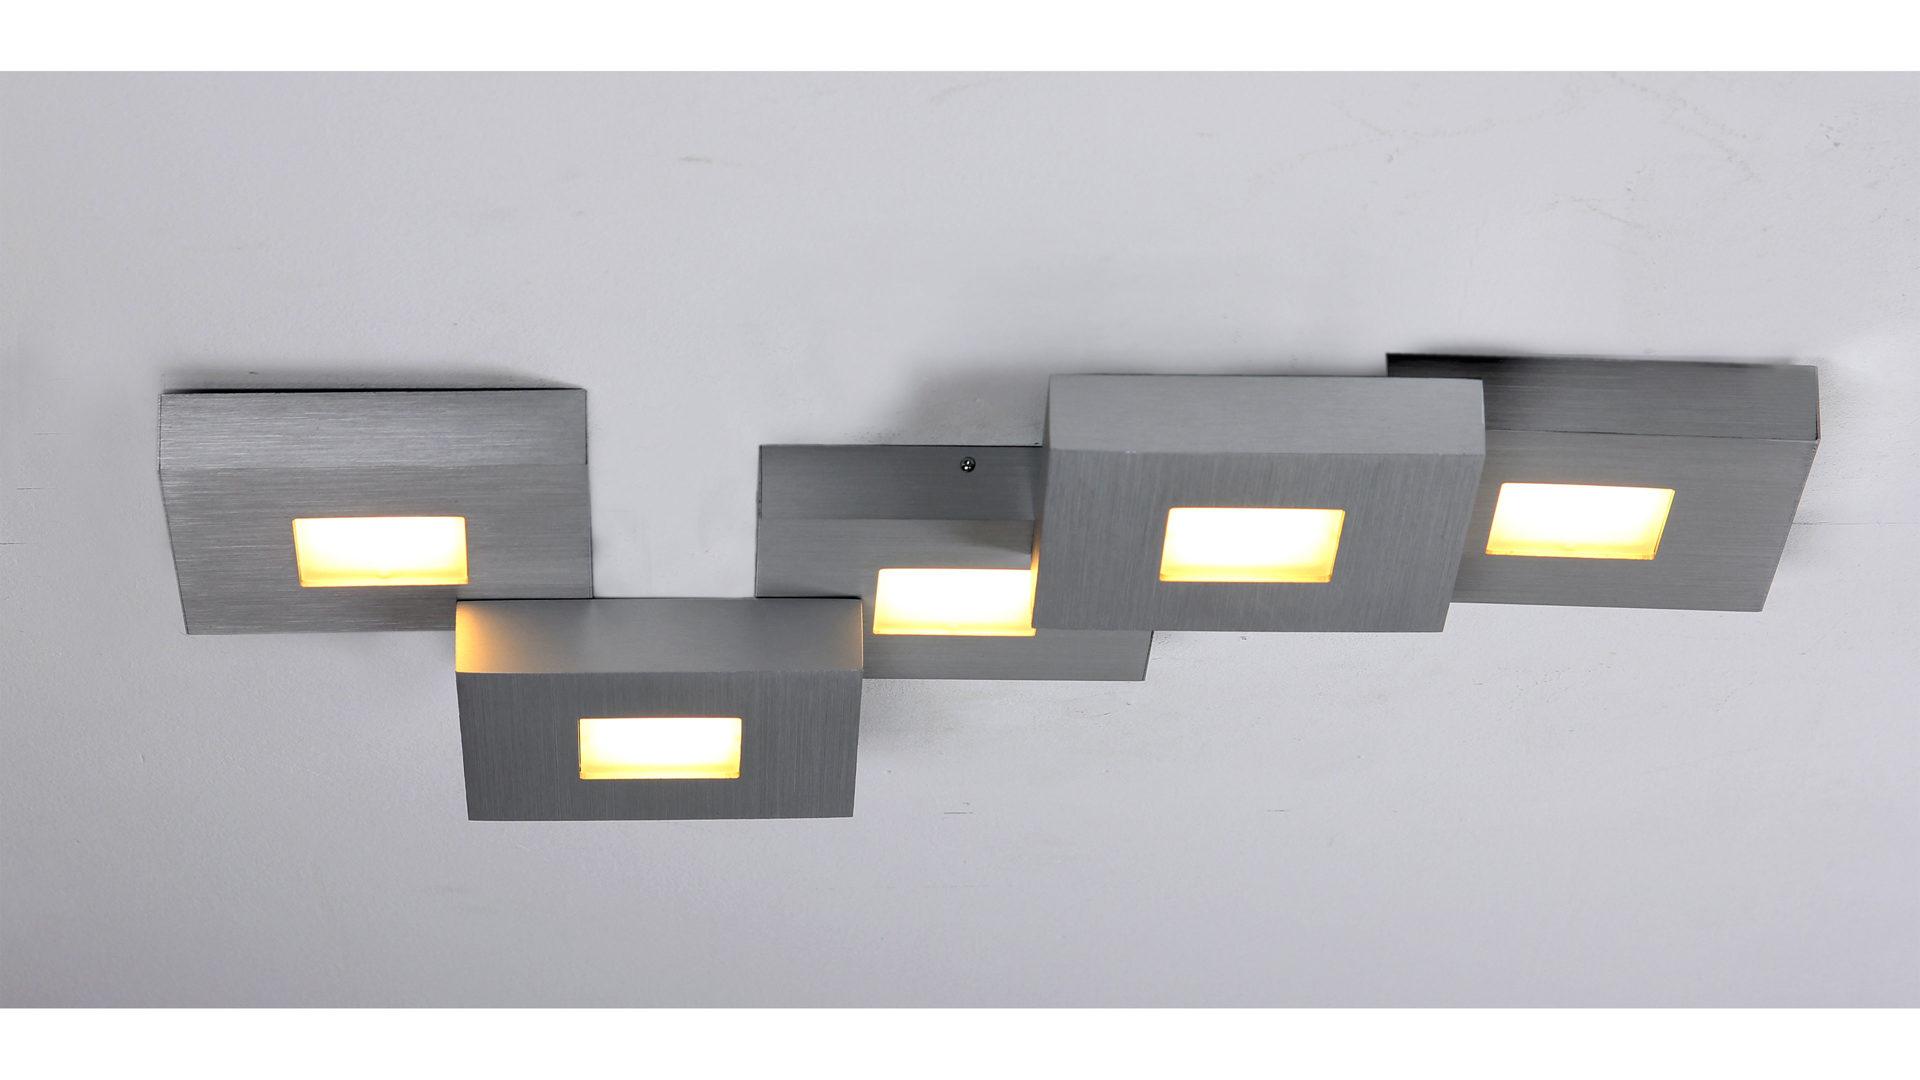 Best Badezimmer Deckenlampen Led Ideas - New Home Design 2018 ...